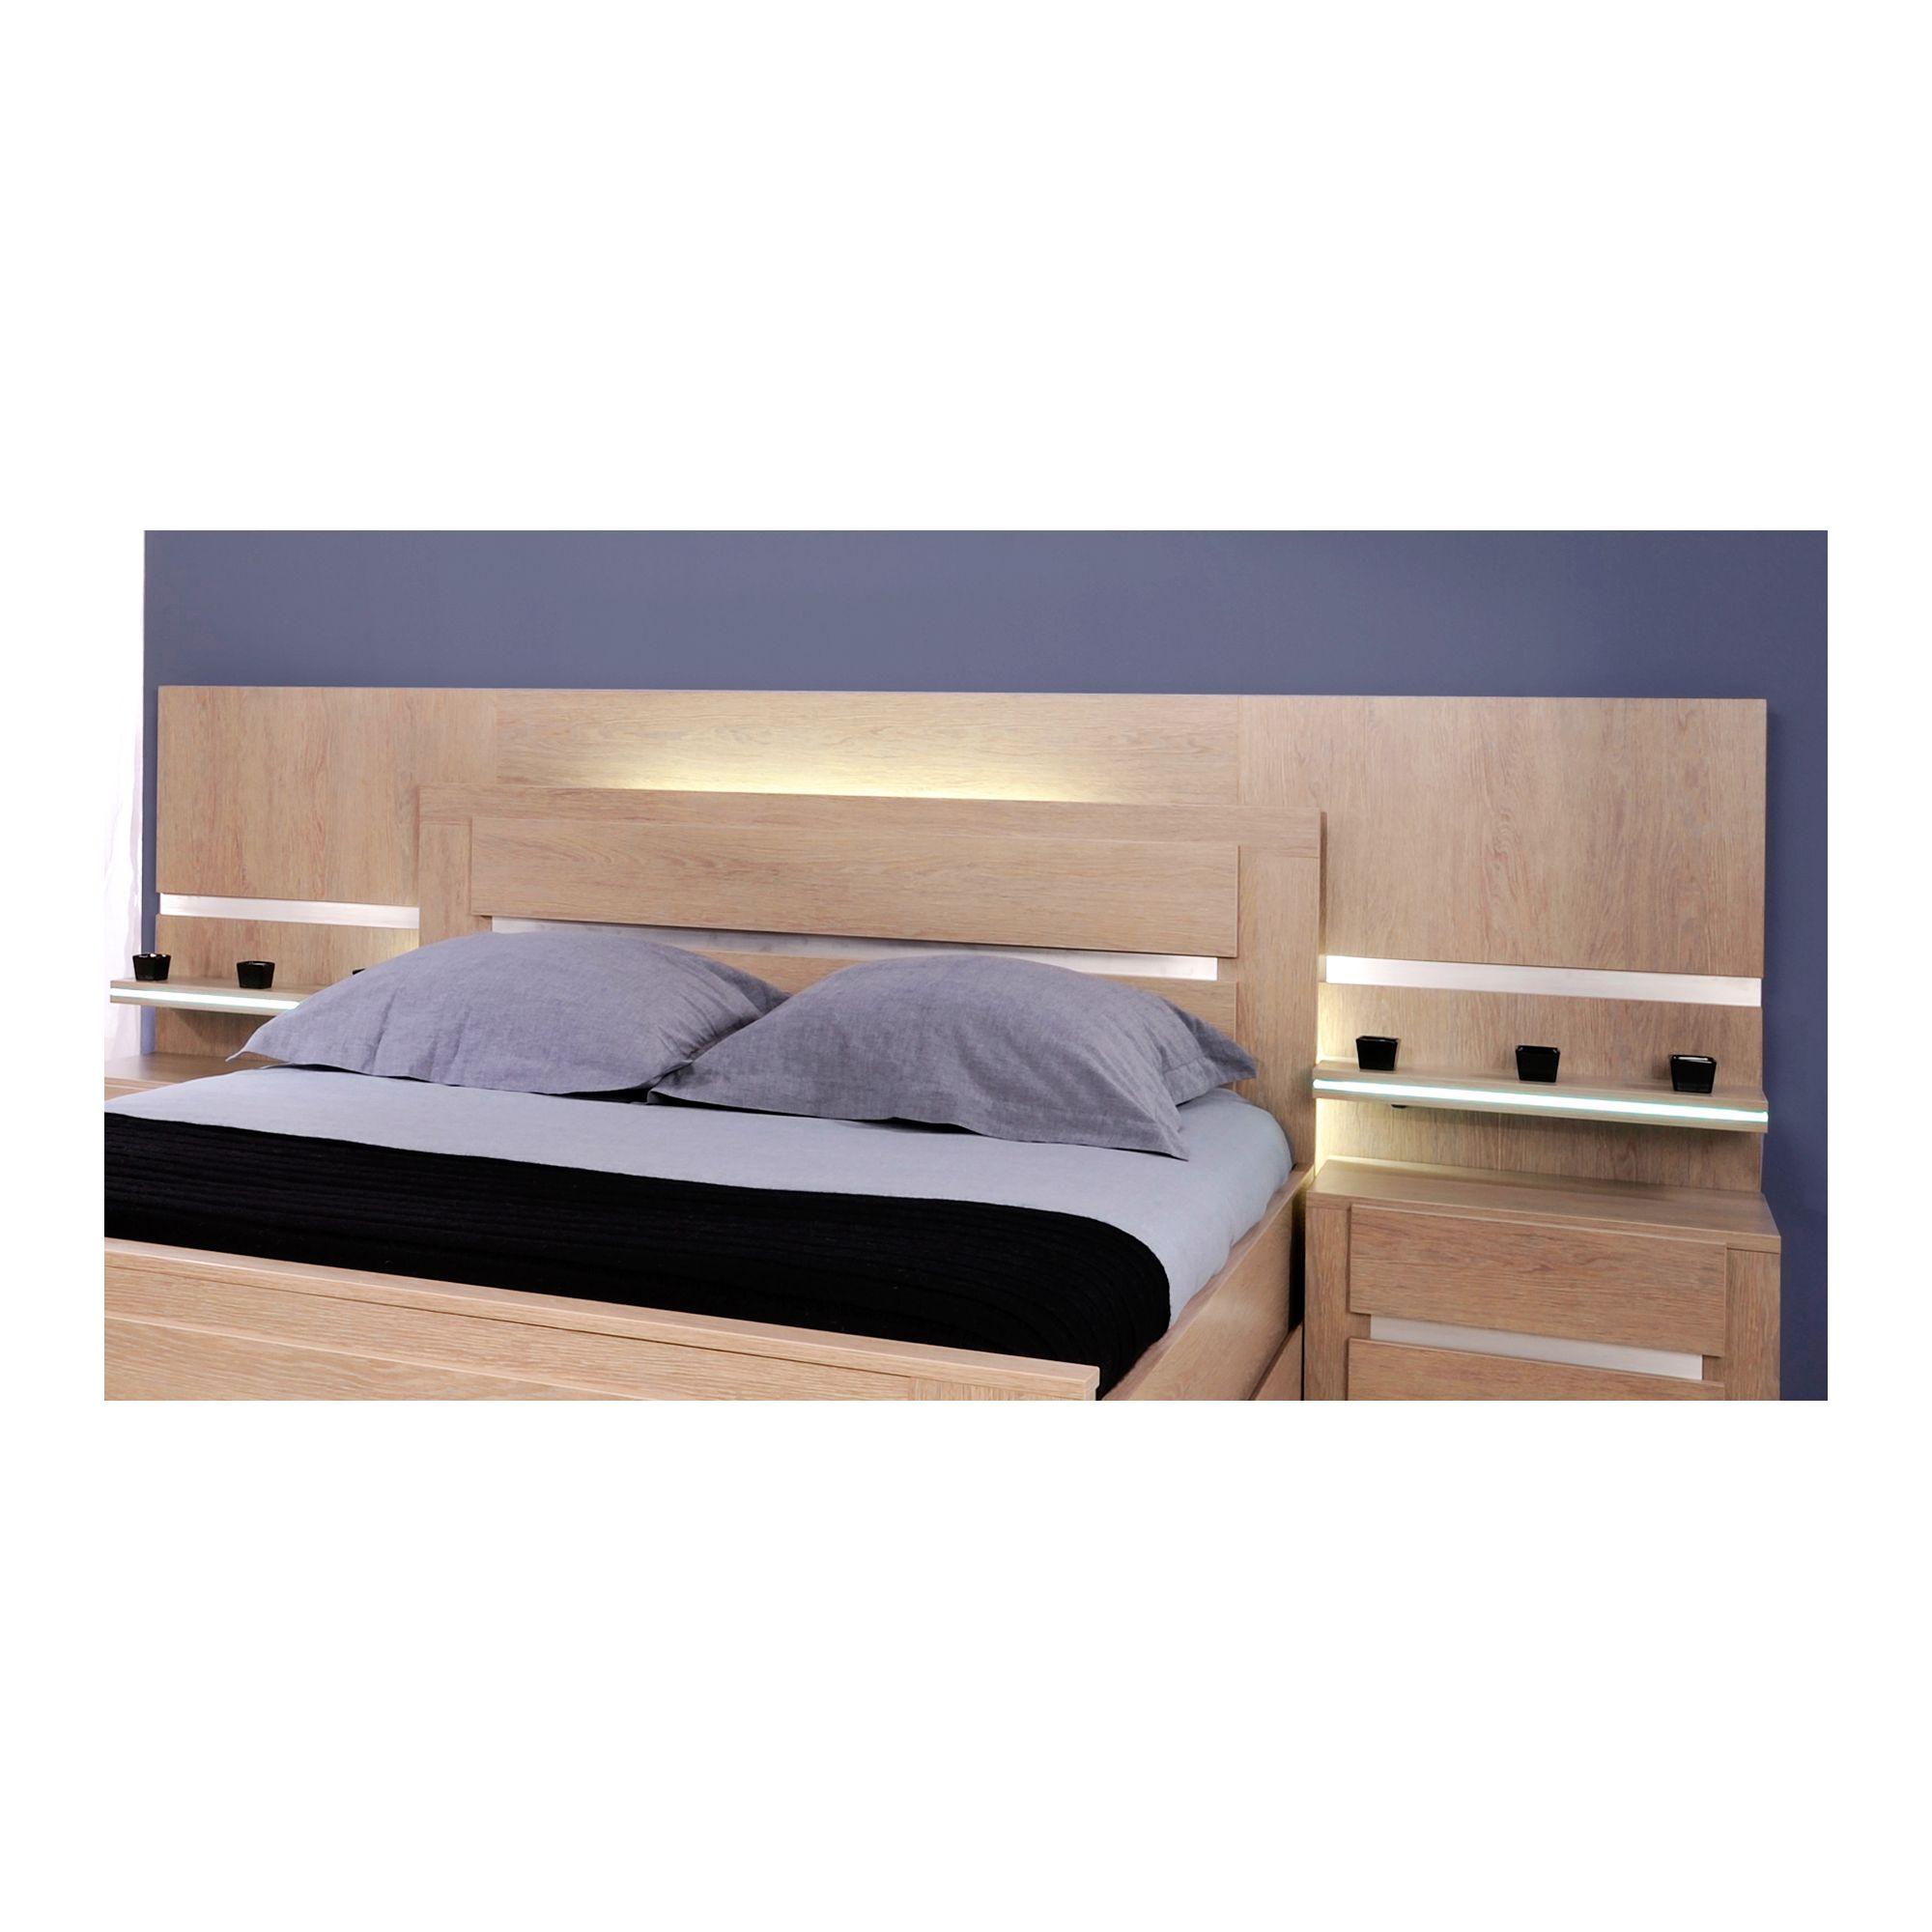 Parisot Shadow Bed Headboard in Ash Oak - European Double at Tescos Direct